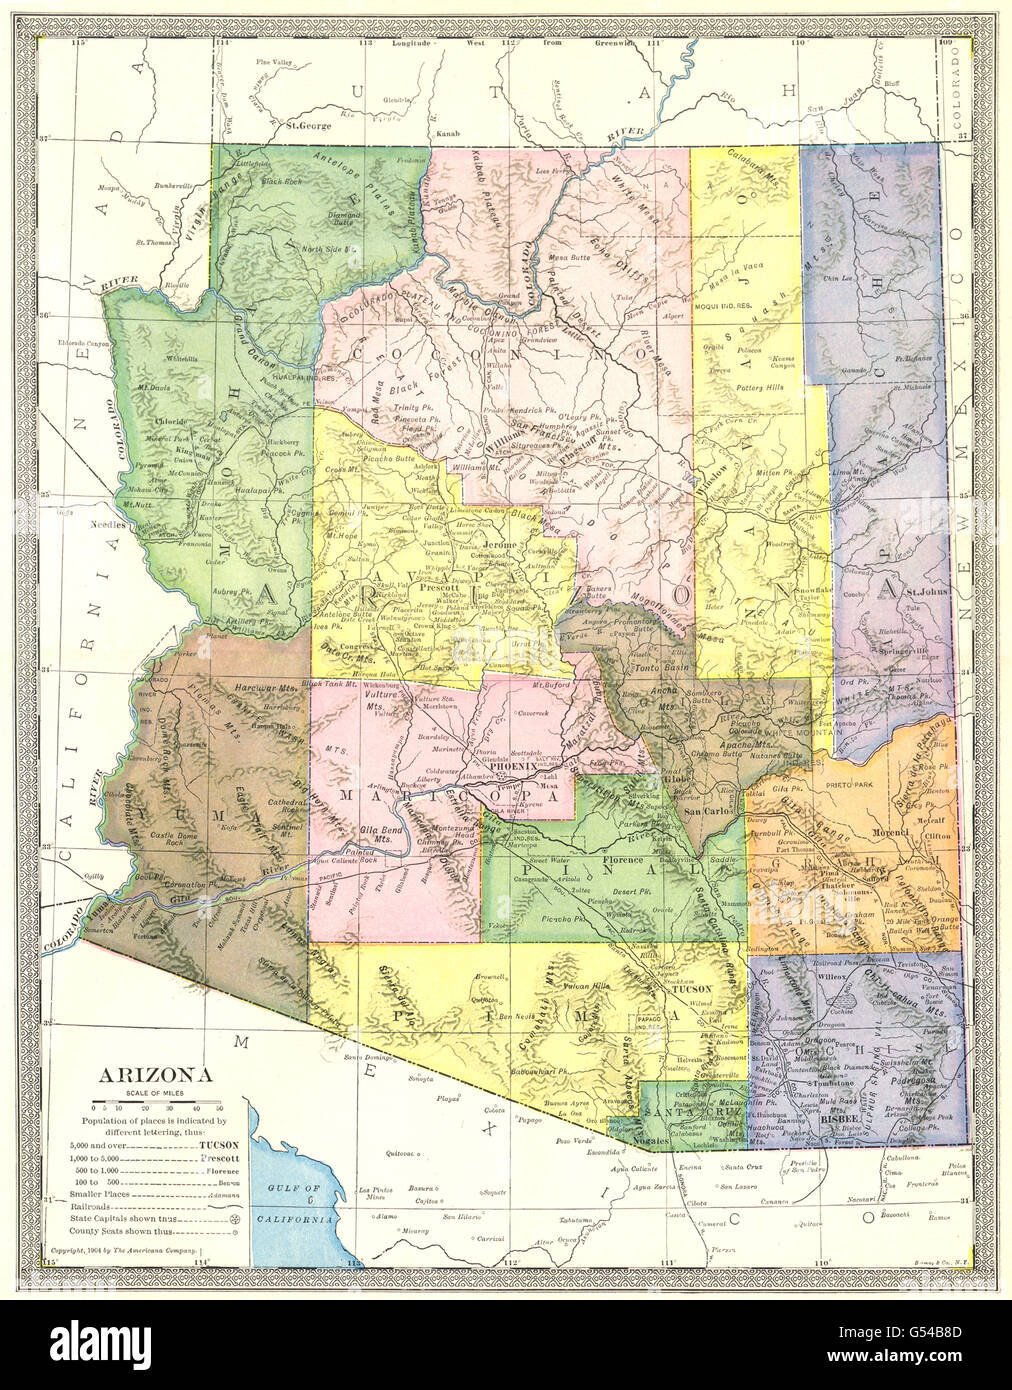 ARIZONA State Map Counties Stock Photo Royalty Free Image - Arizona state map